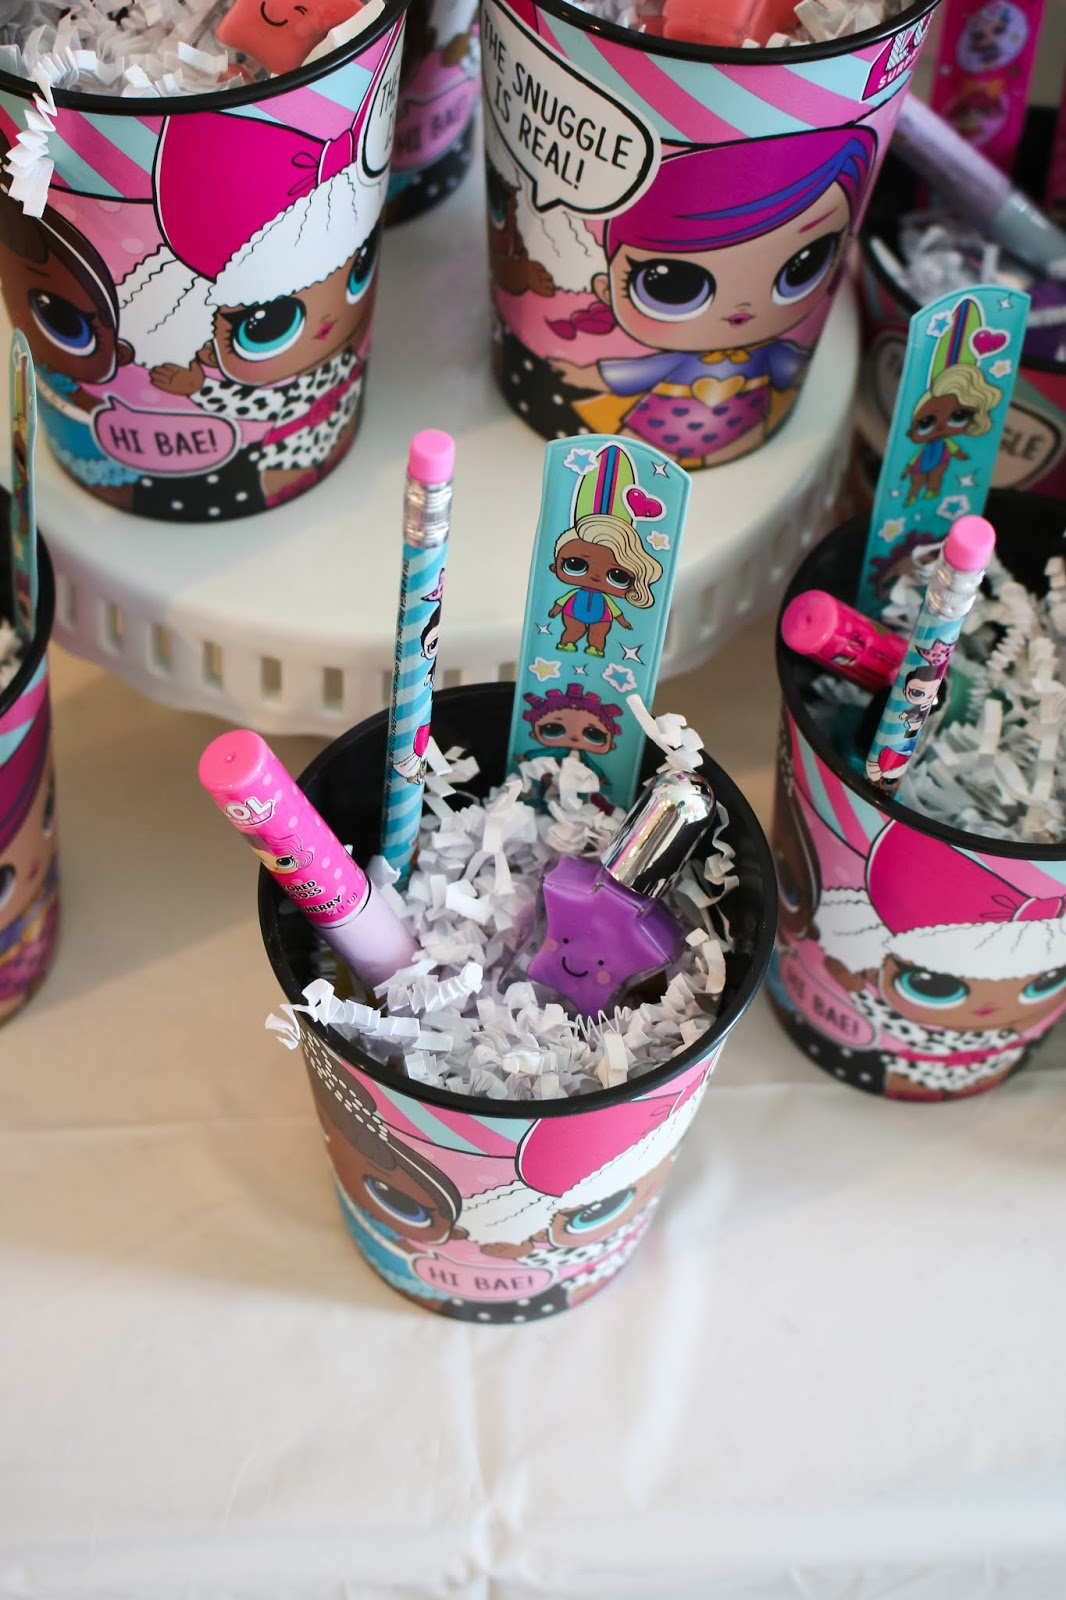 Nadia S Lol Dolls Birthday Party Was So Cute Pretty Real